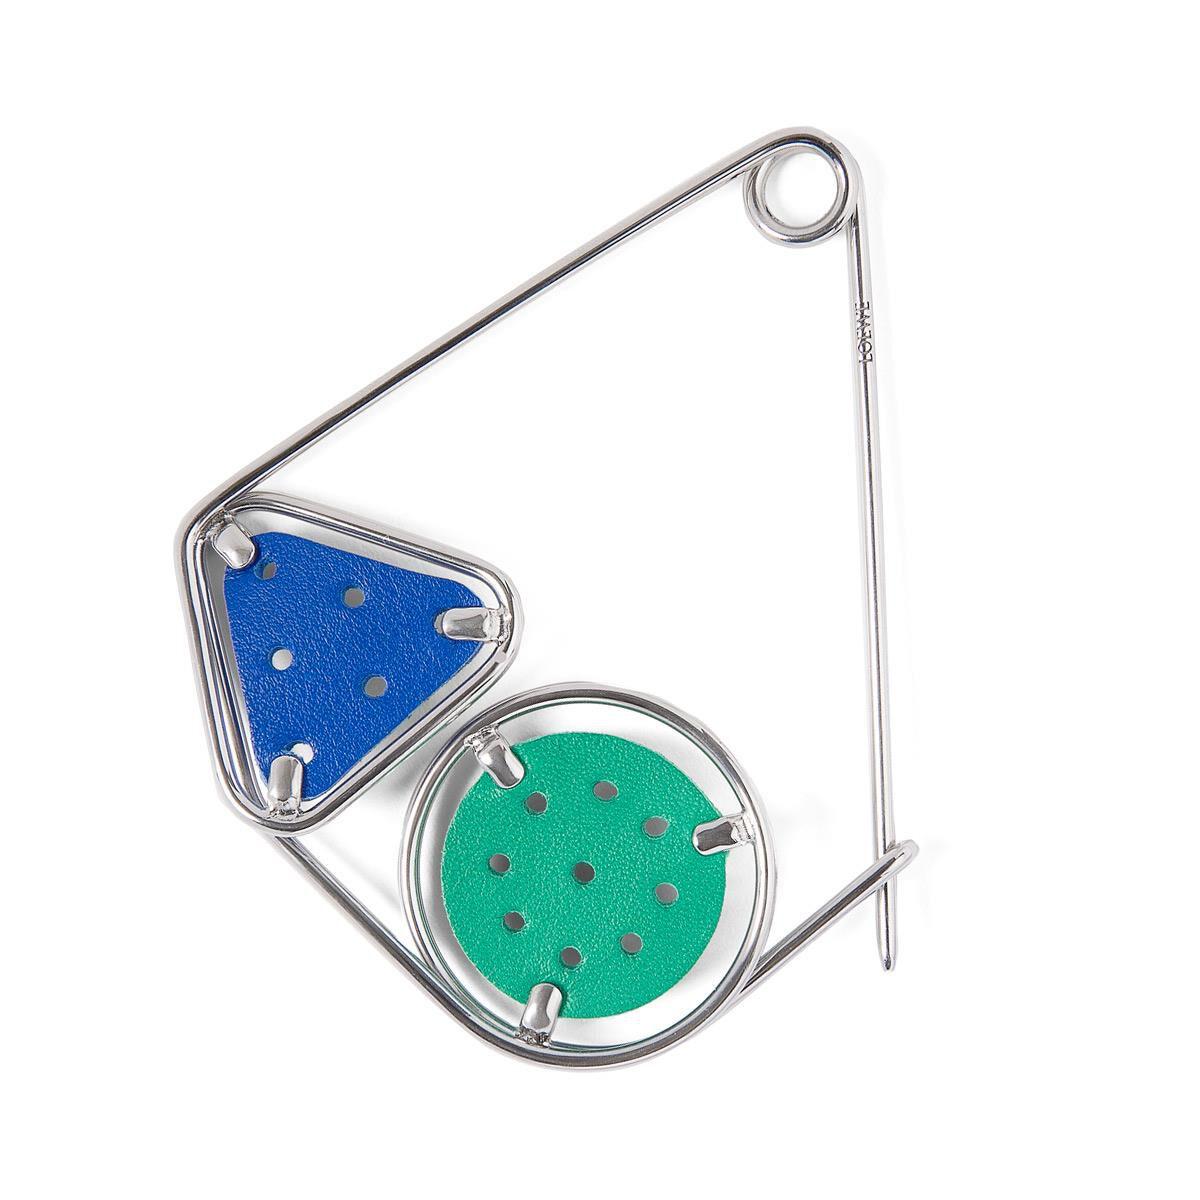 LOEWE Pin Meccano Doble Peq Verde/Azul Eléctrico/ Paladio all